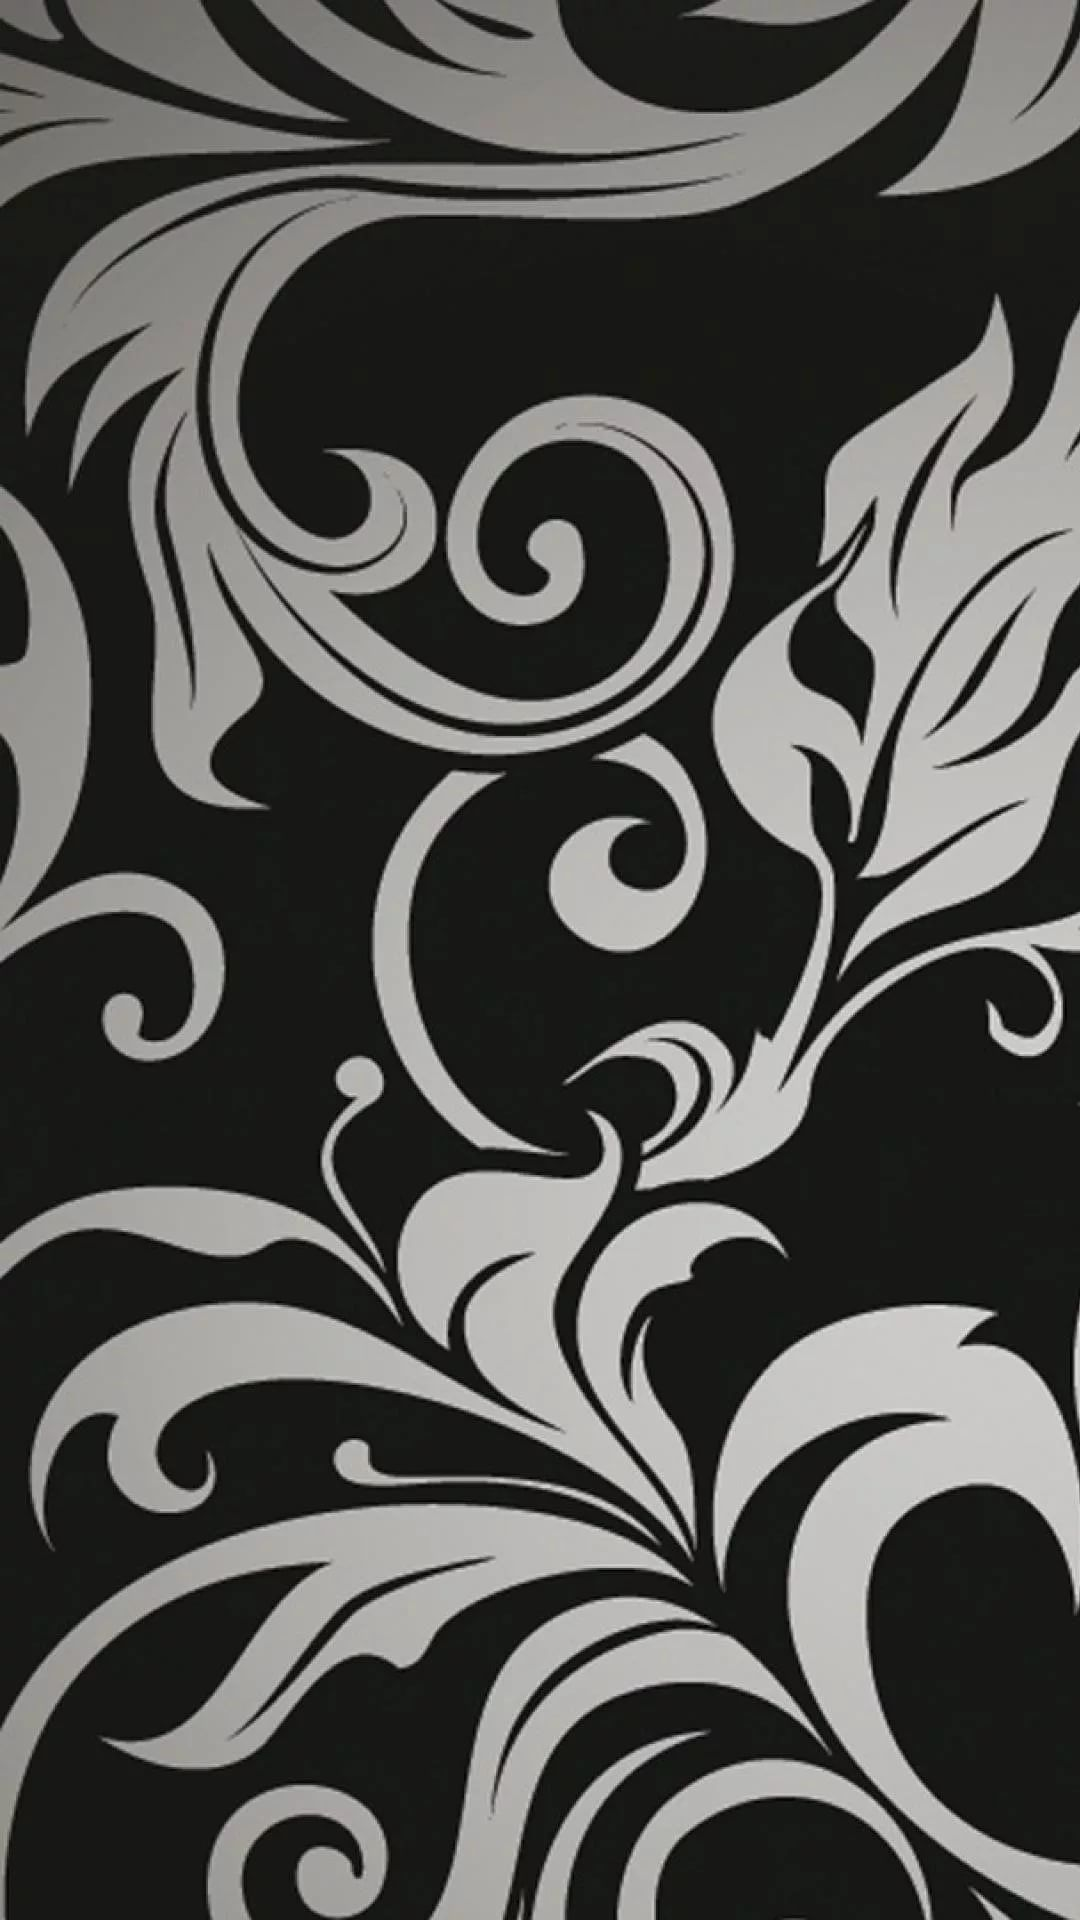 Black And White Flower Samsung Galaxy s8 wallpaper